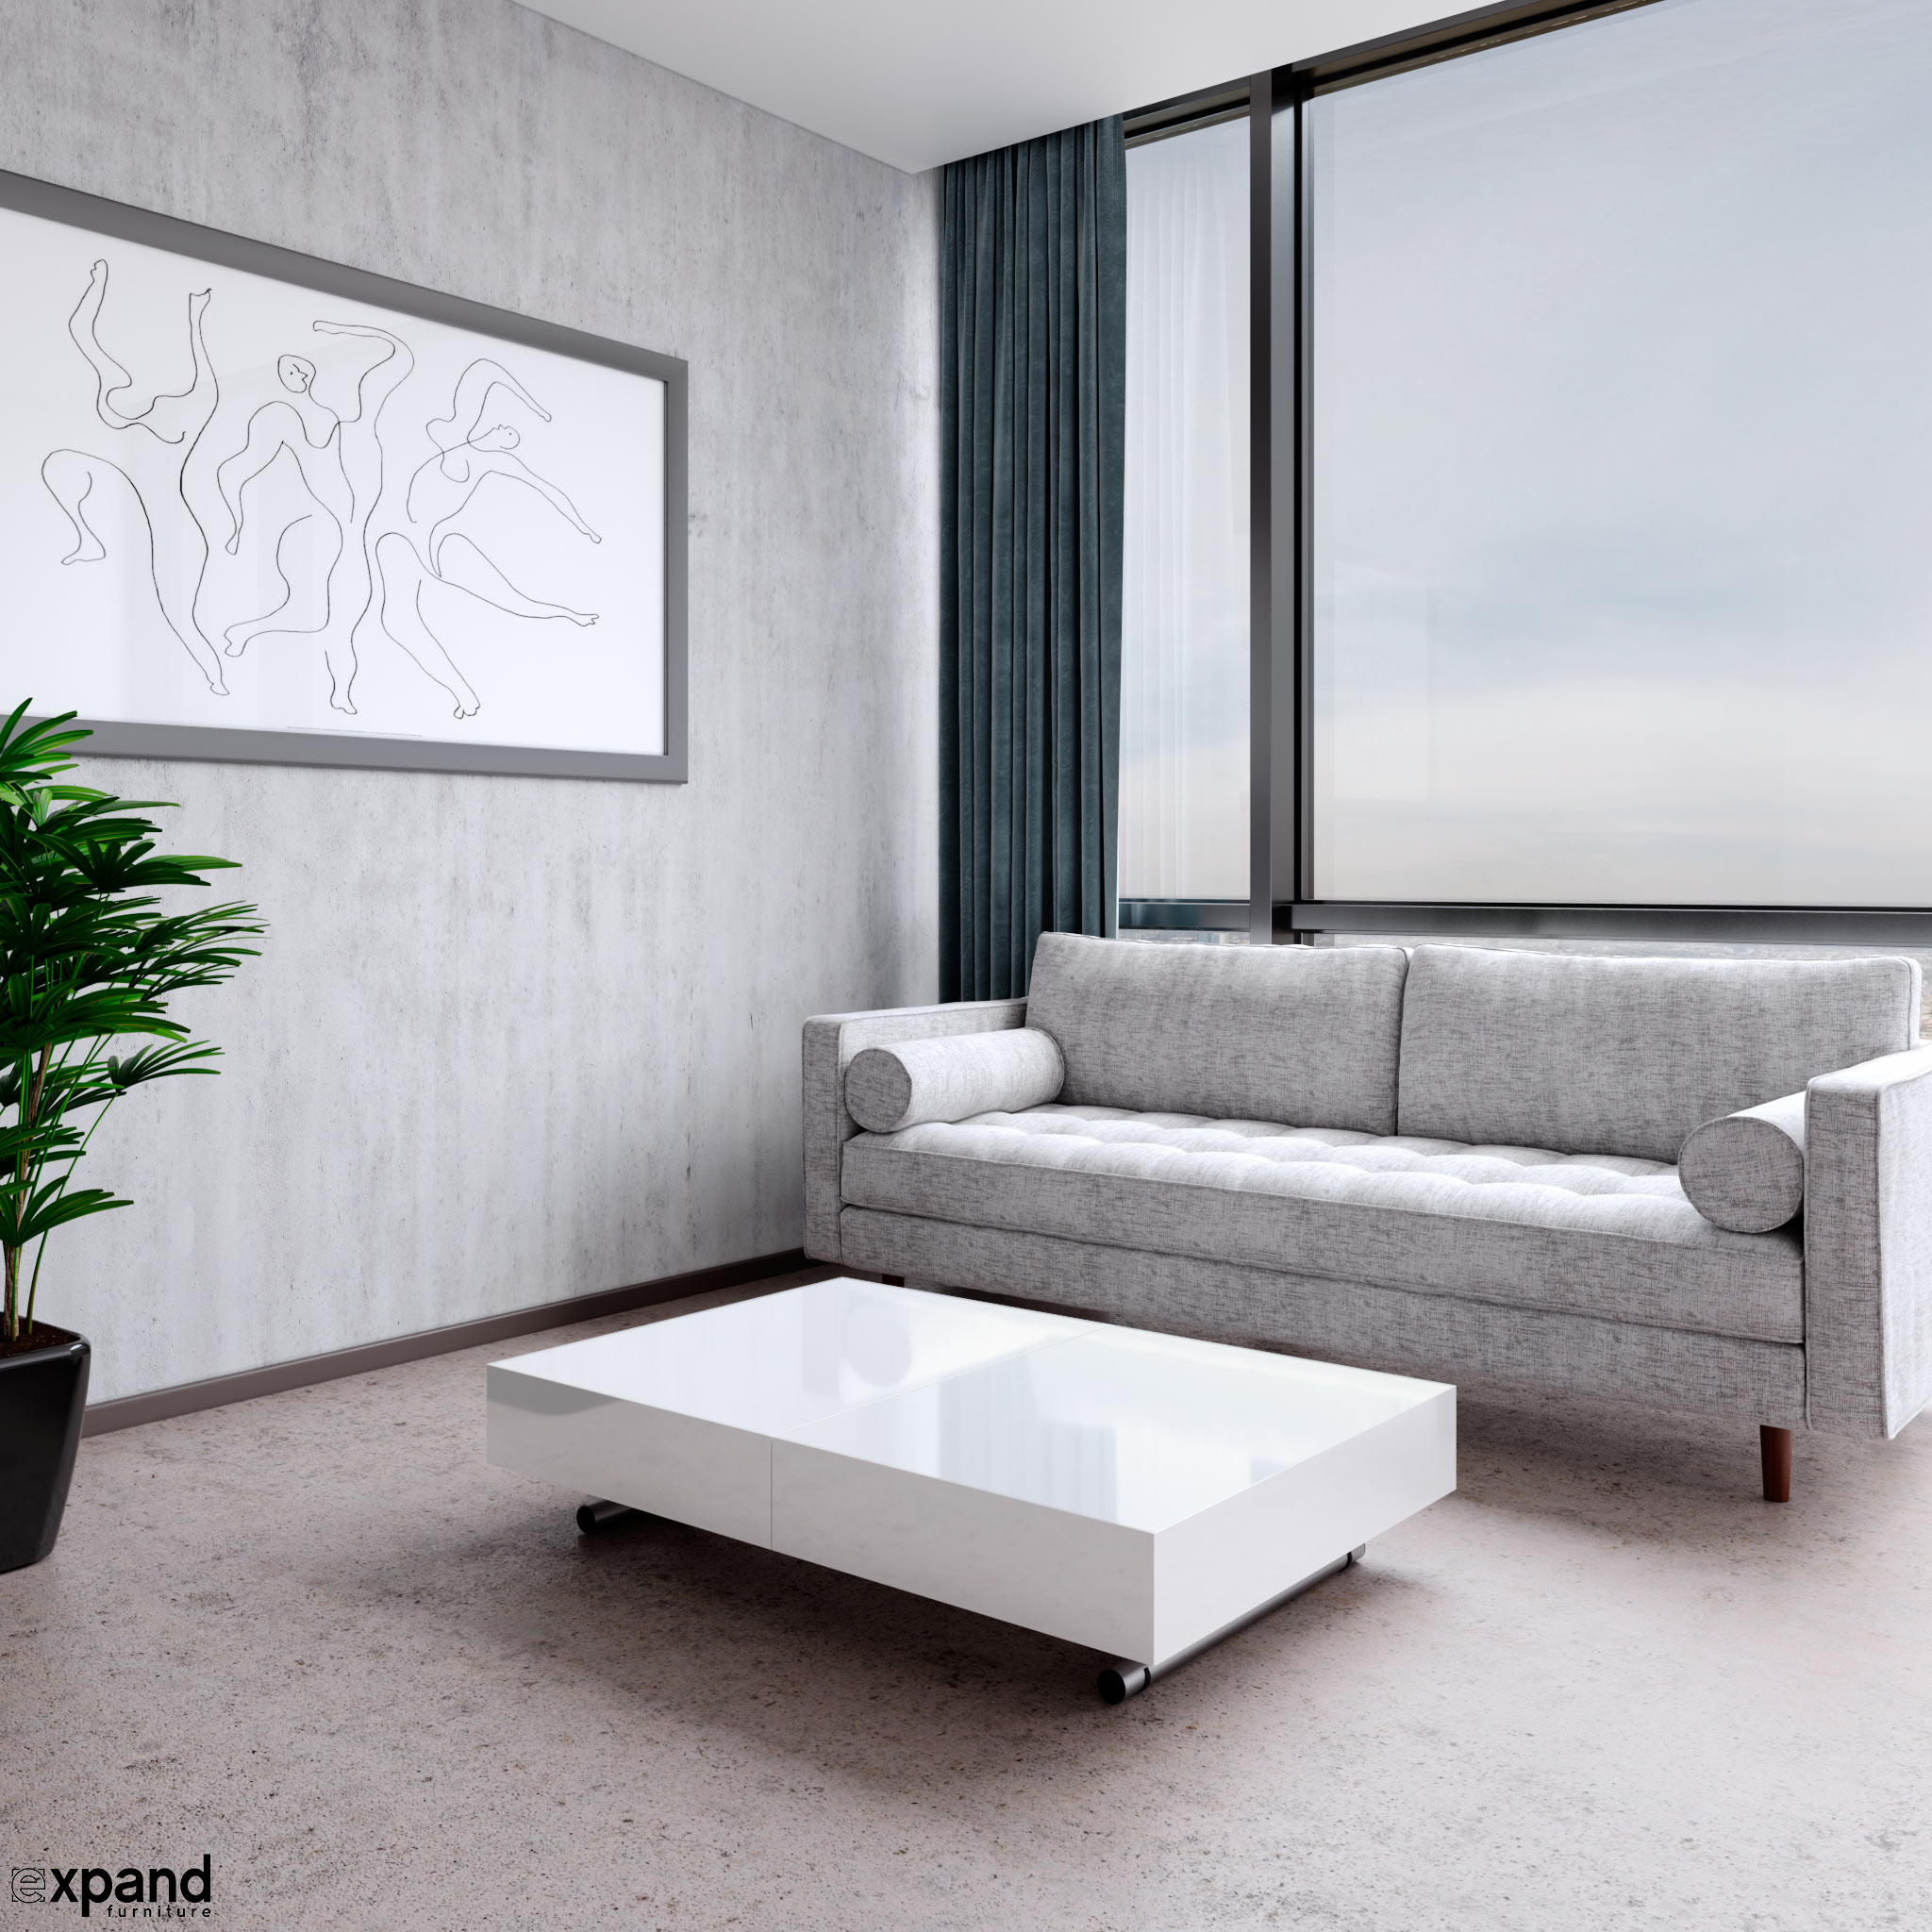 Scandormi Modern Sofa Grey Mid Century Tufted Couch